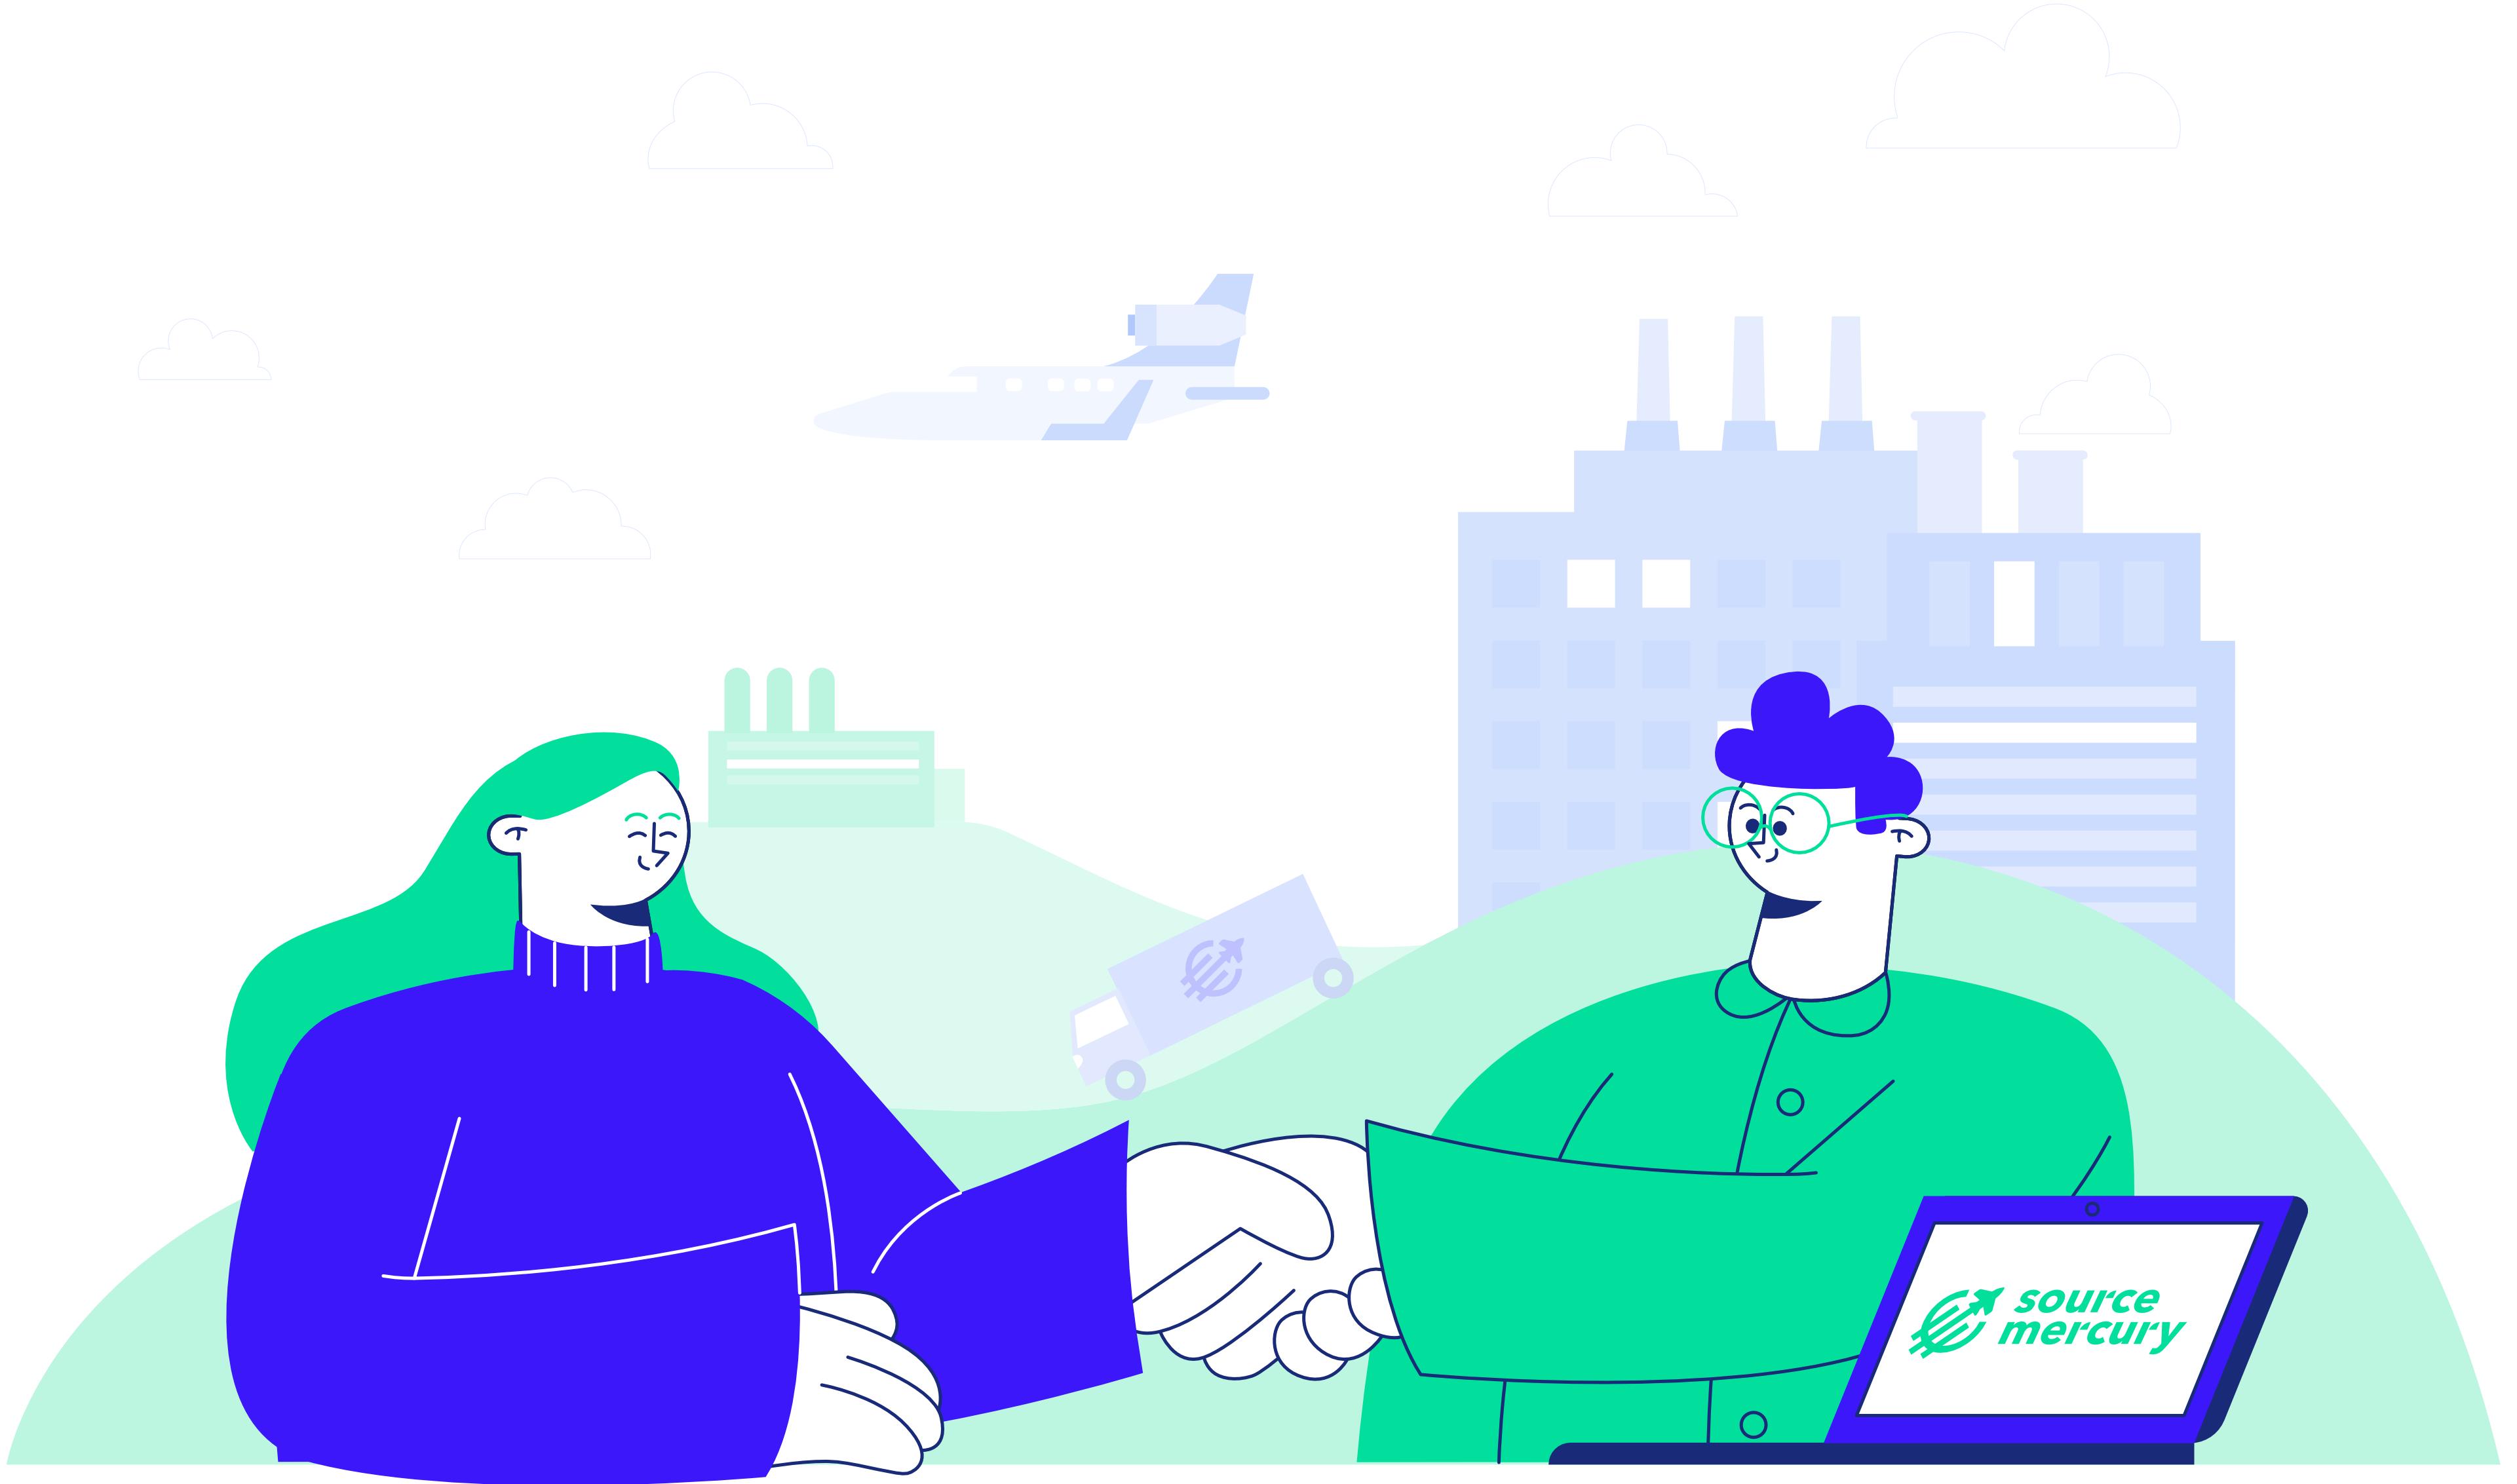 Contract handshake illustration